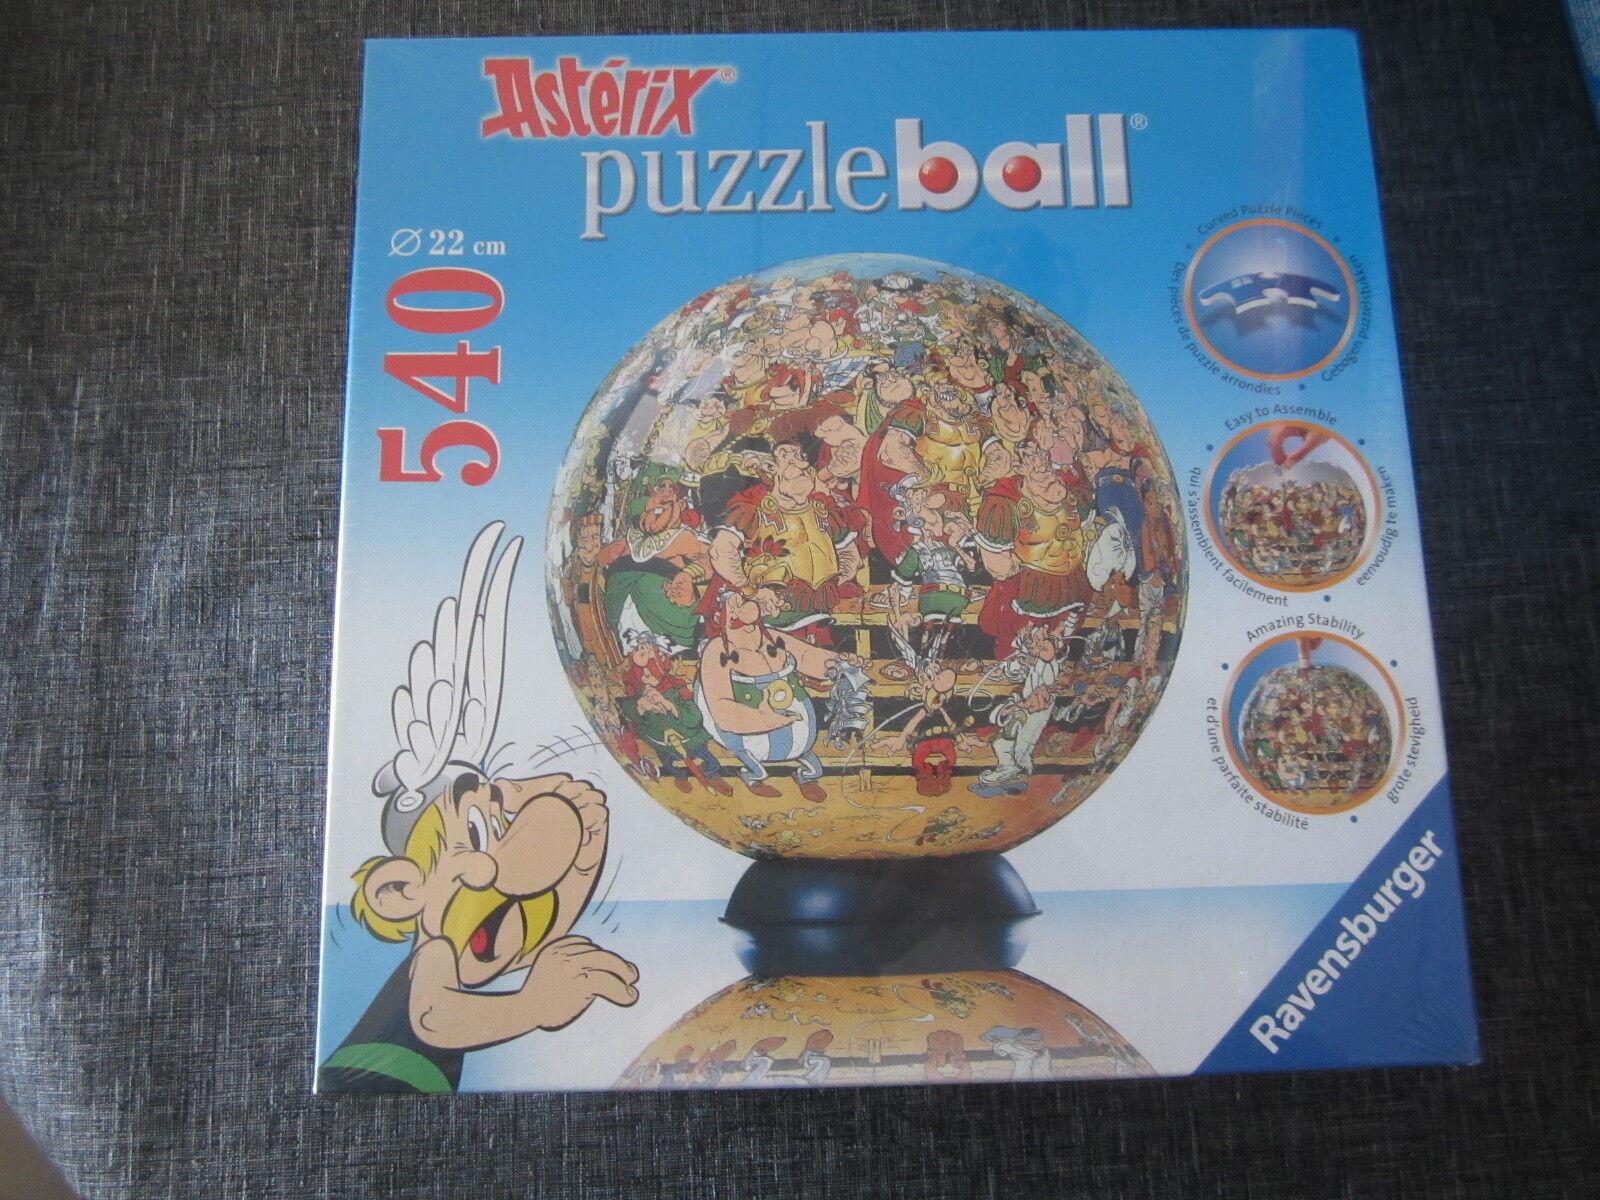 PUZZLE BALL 540 RAVENSBURGER ASTERIX 22 CM   9 CM AÑO 2006